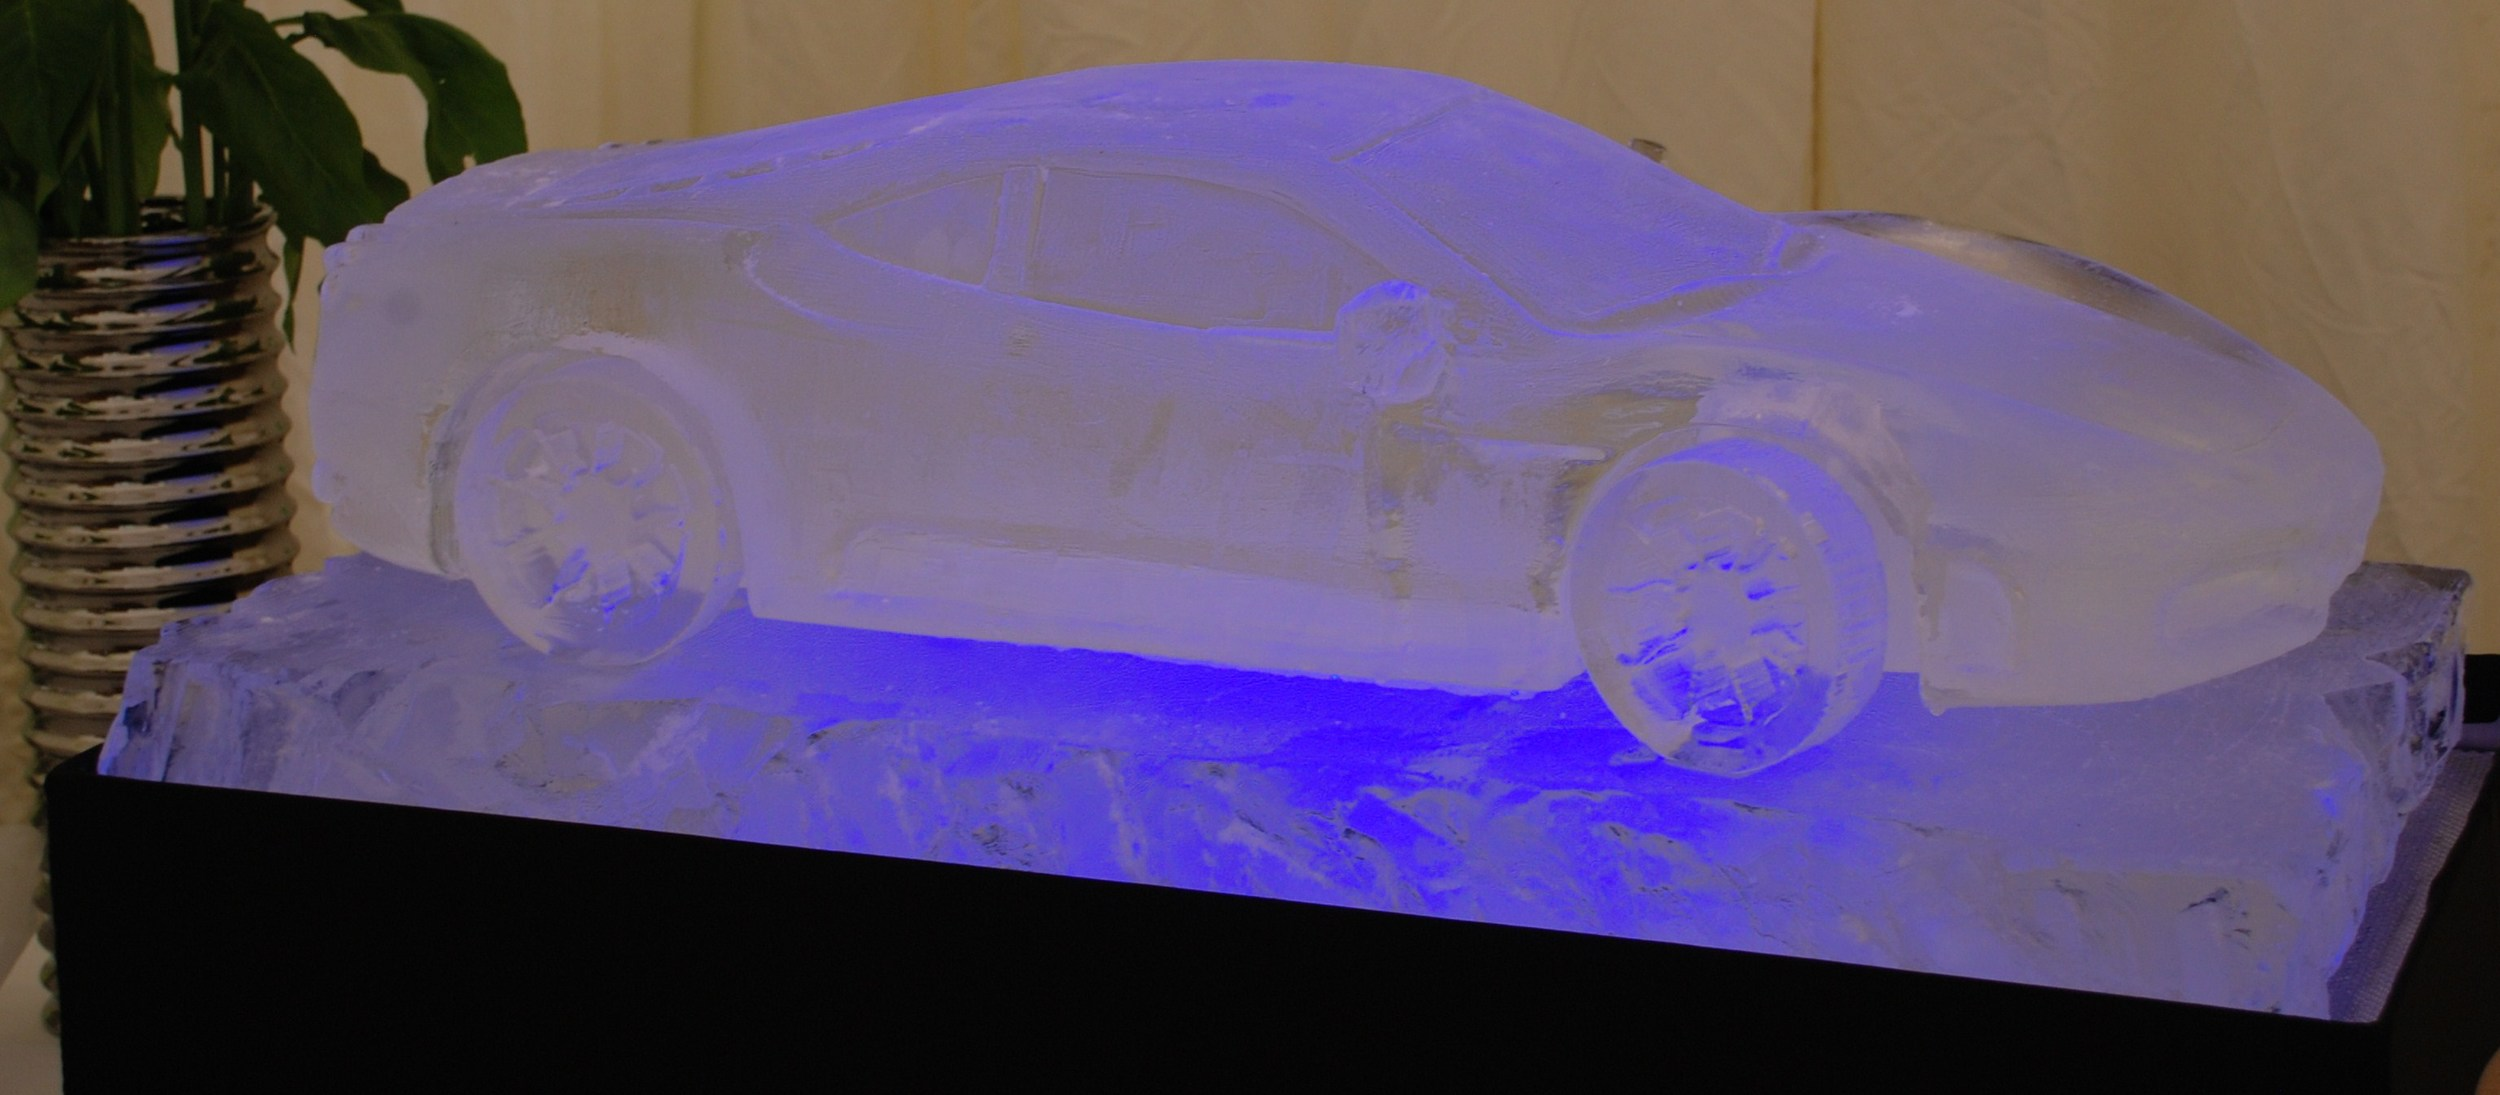 Ferrari F430 Ice Sculpture